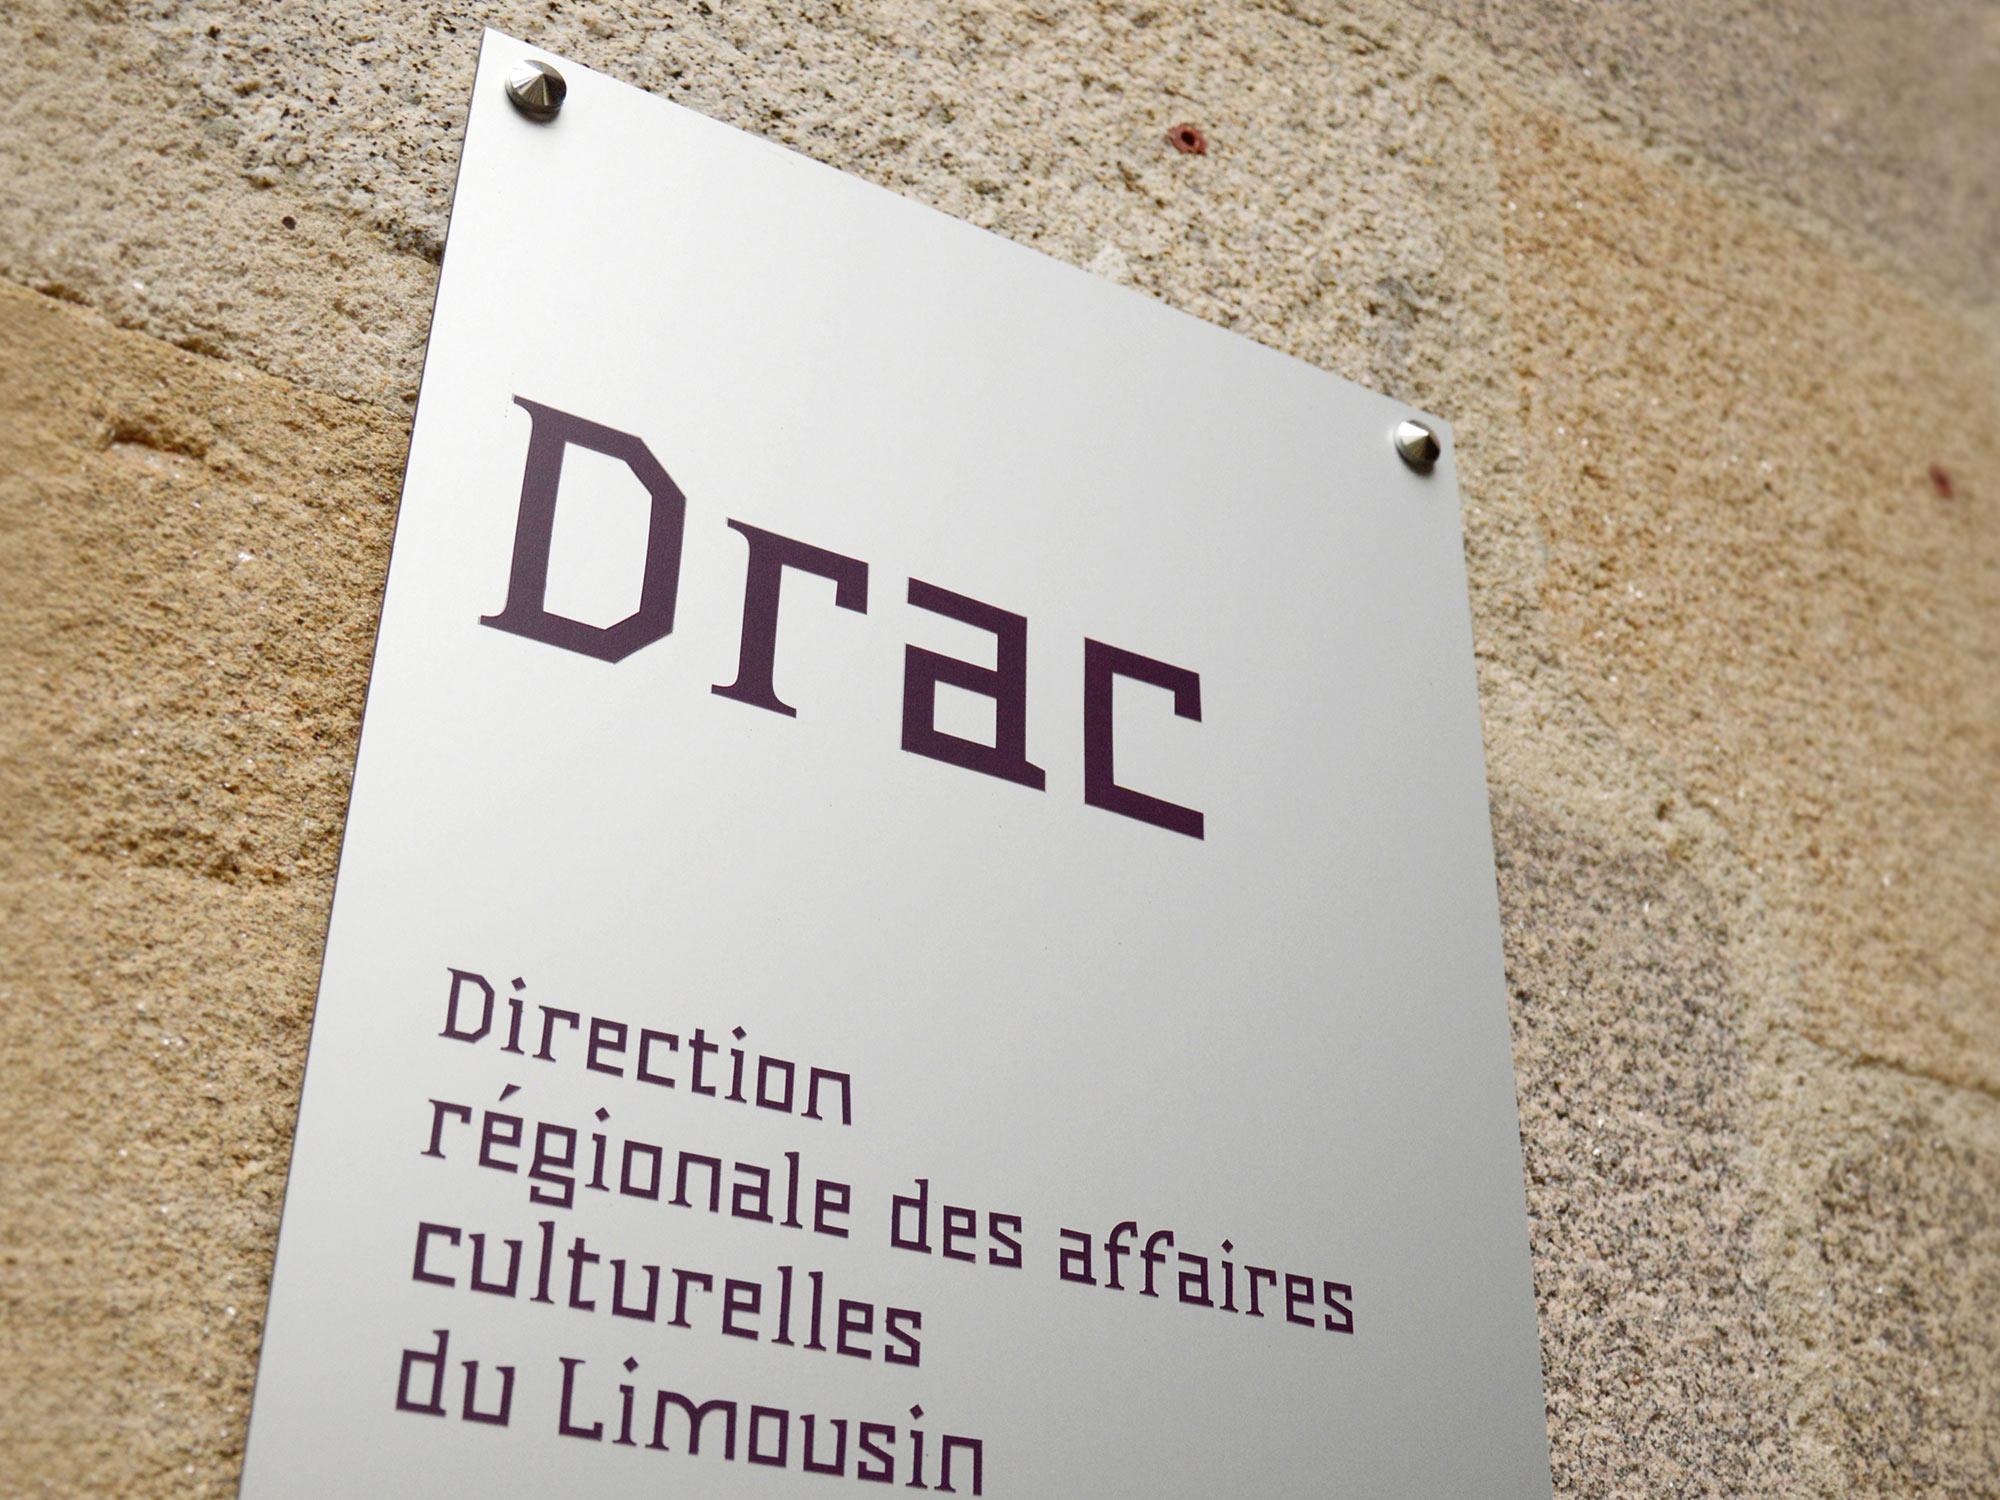 http://a-aa.fr/projet/drac-limousin-signaletique/